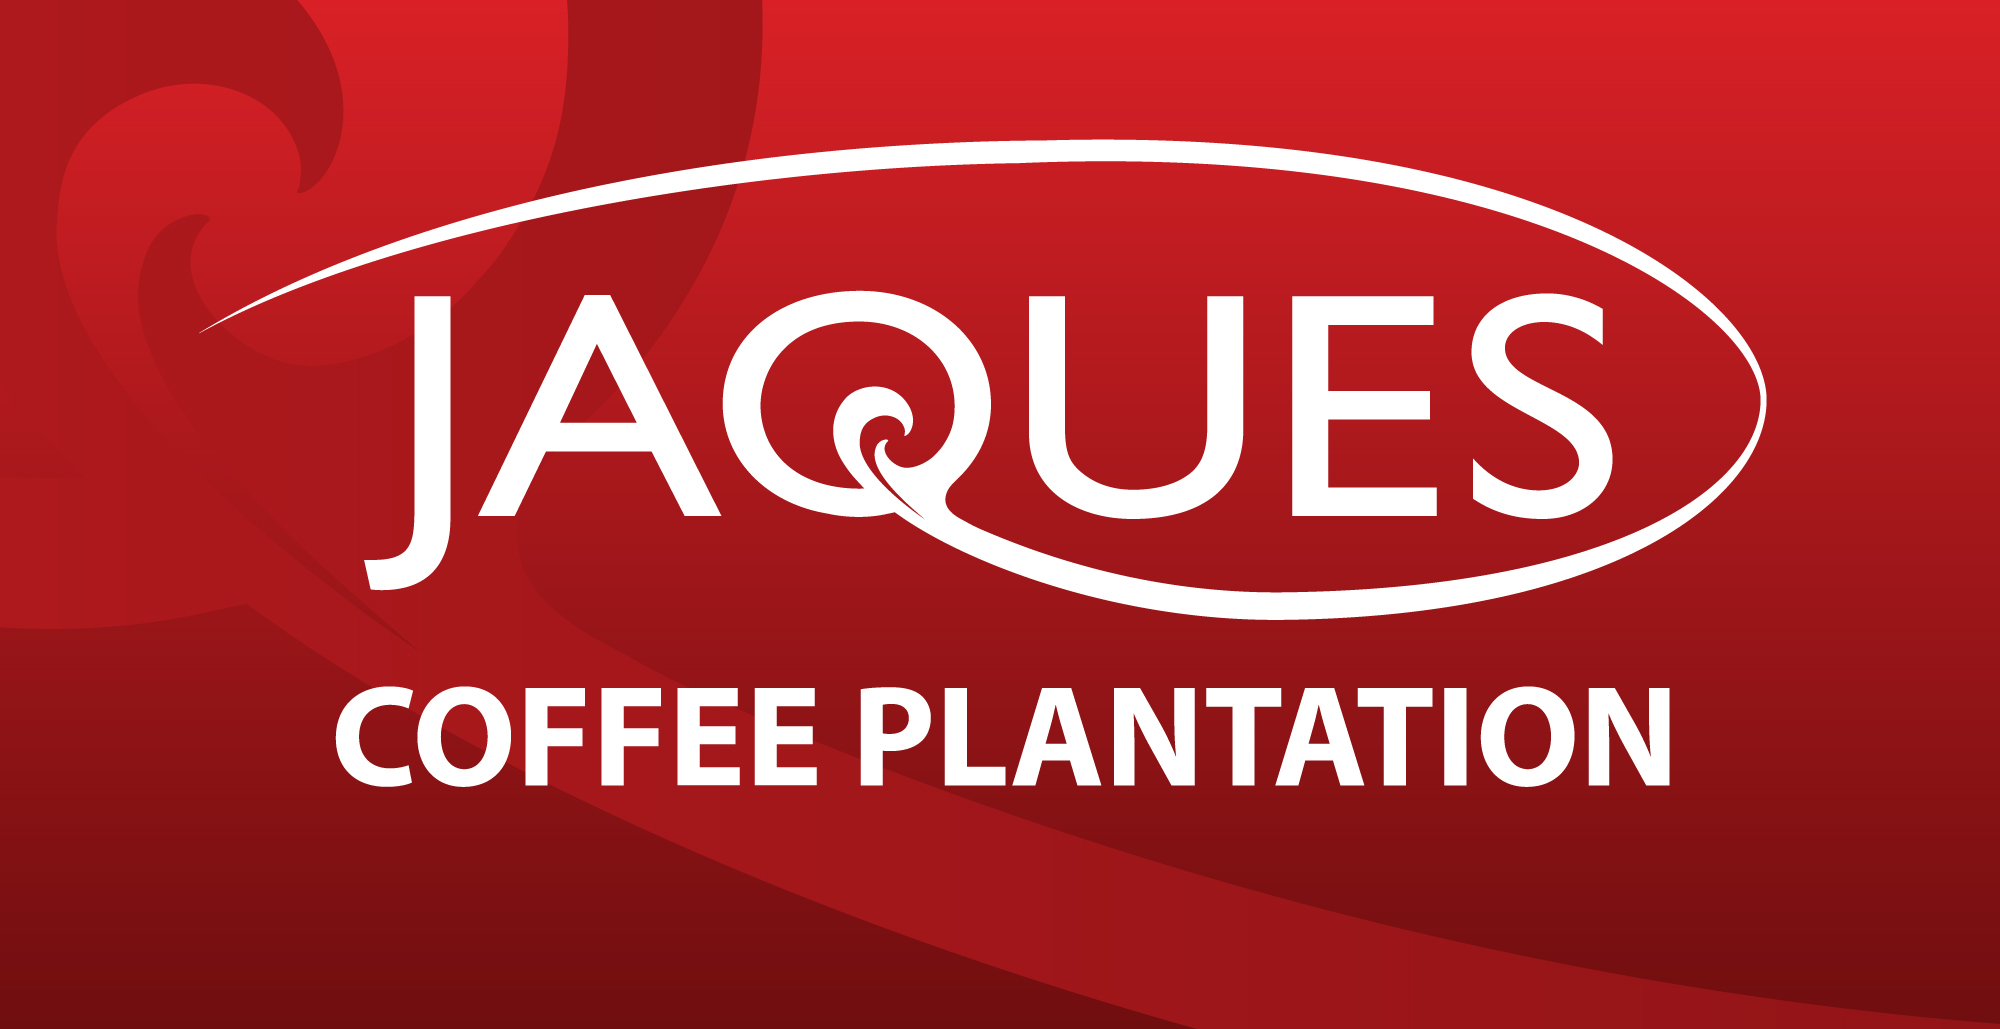 logo_jaques_coffee_plantation_on_red_swirl.jpg